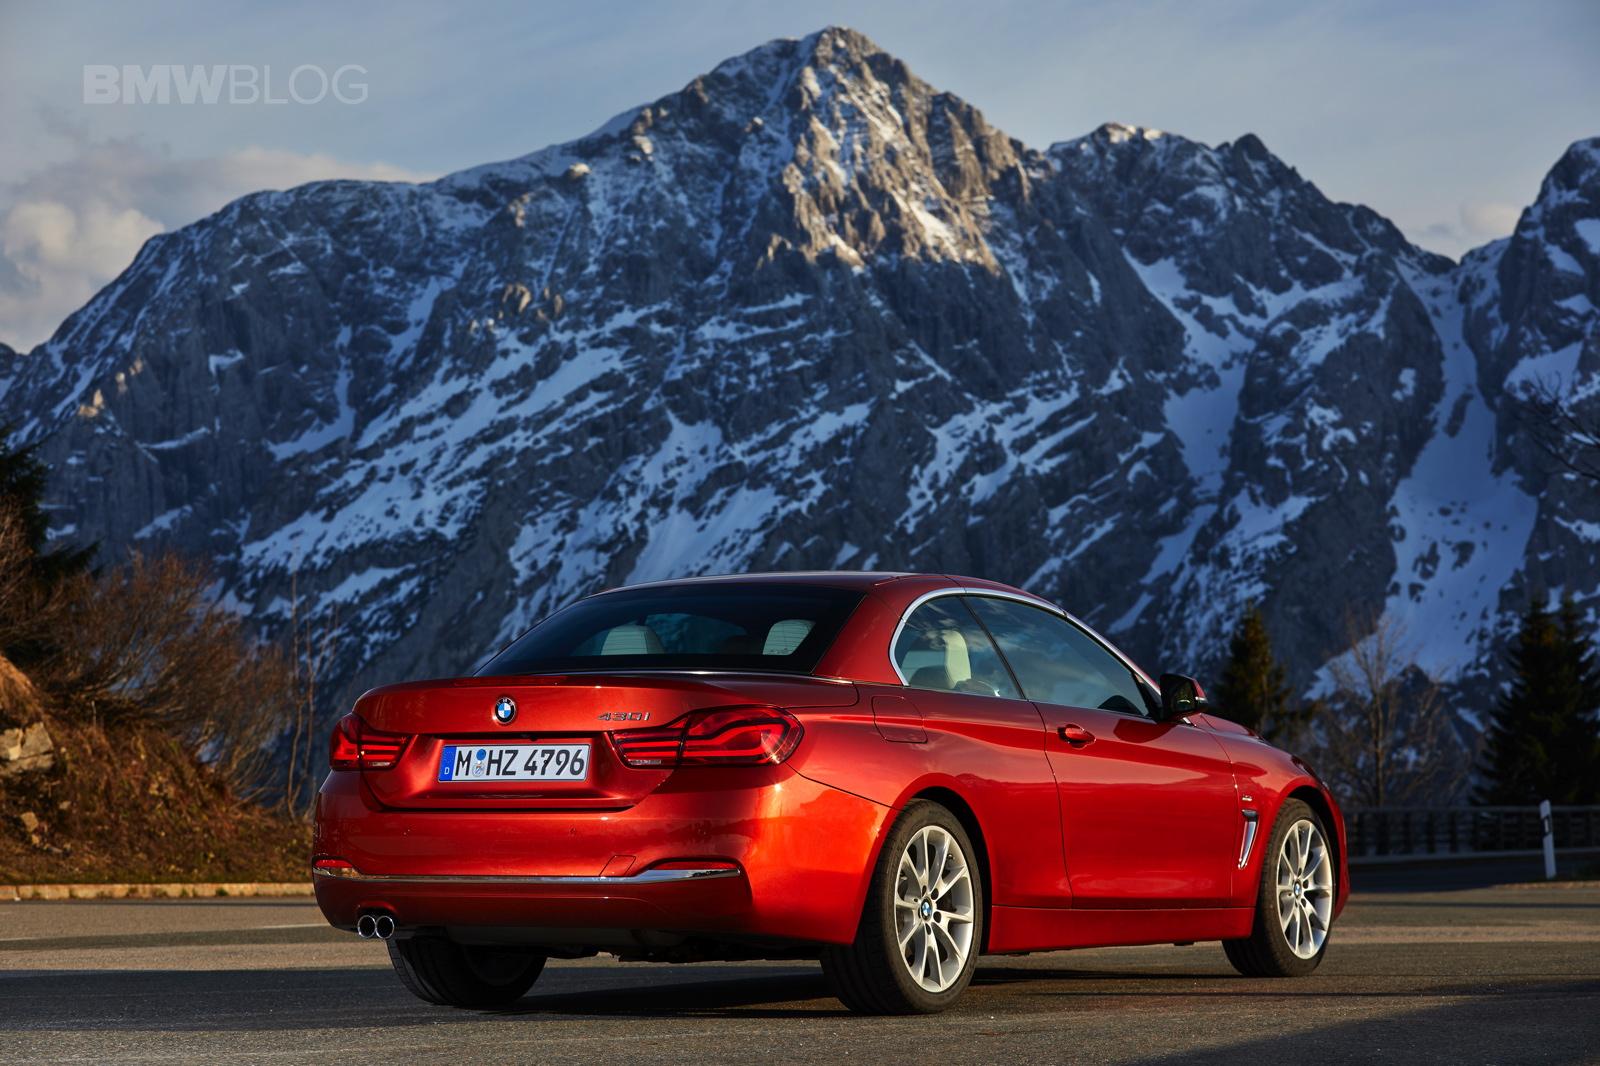 2017 BMW 4 Series Convertible test drive 25